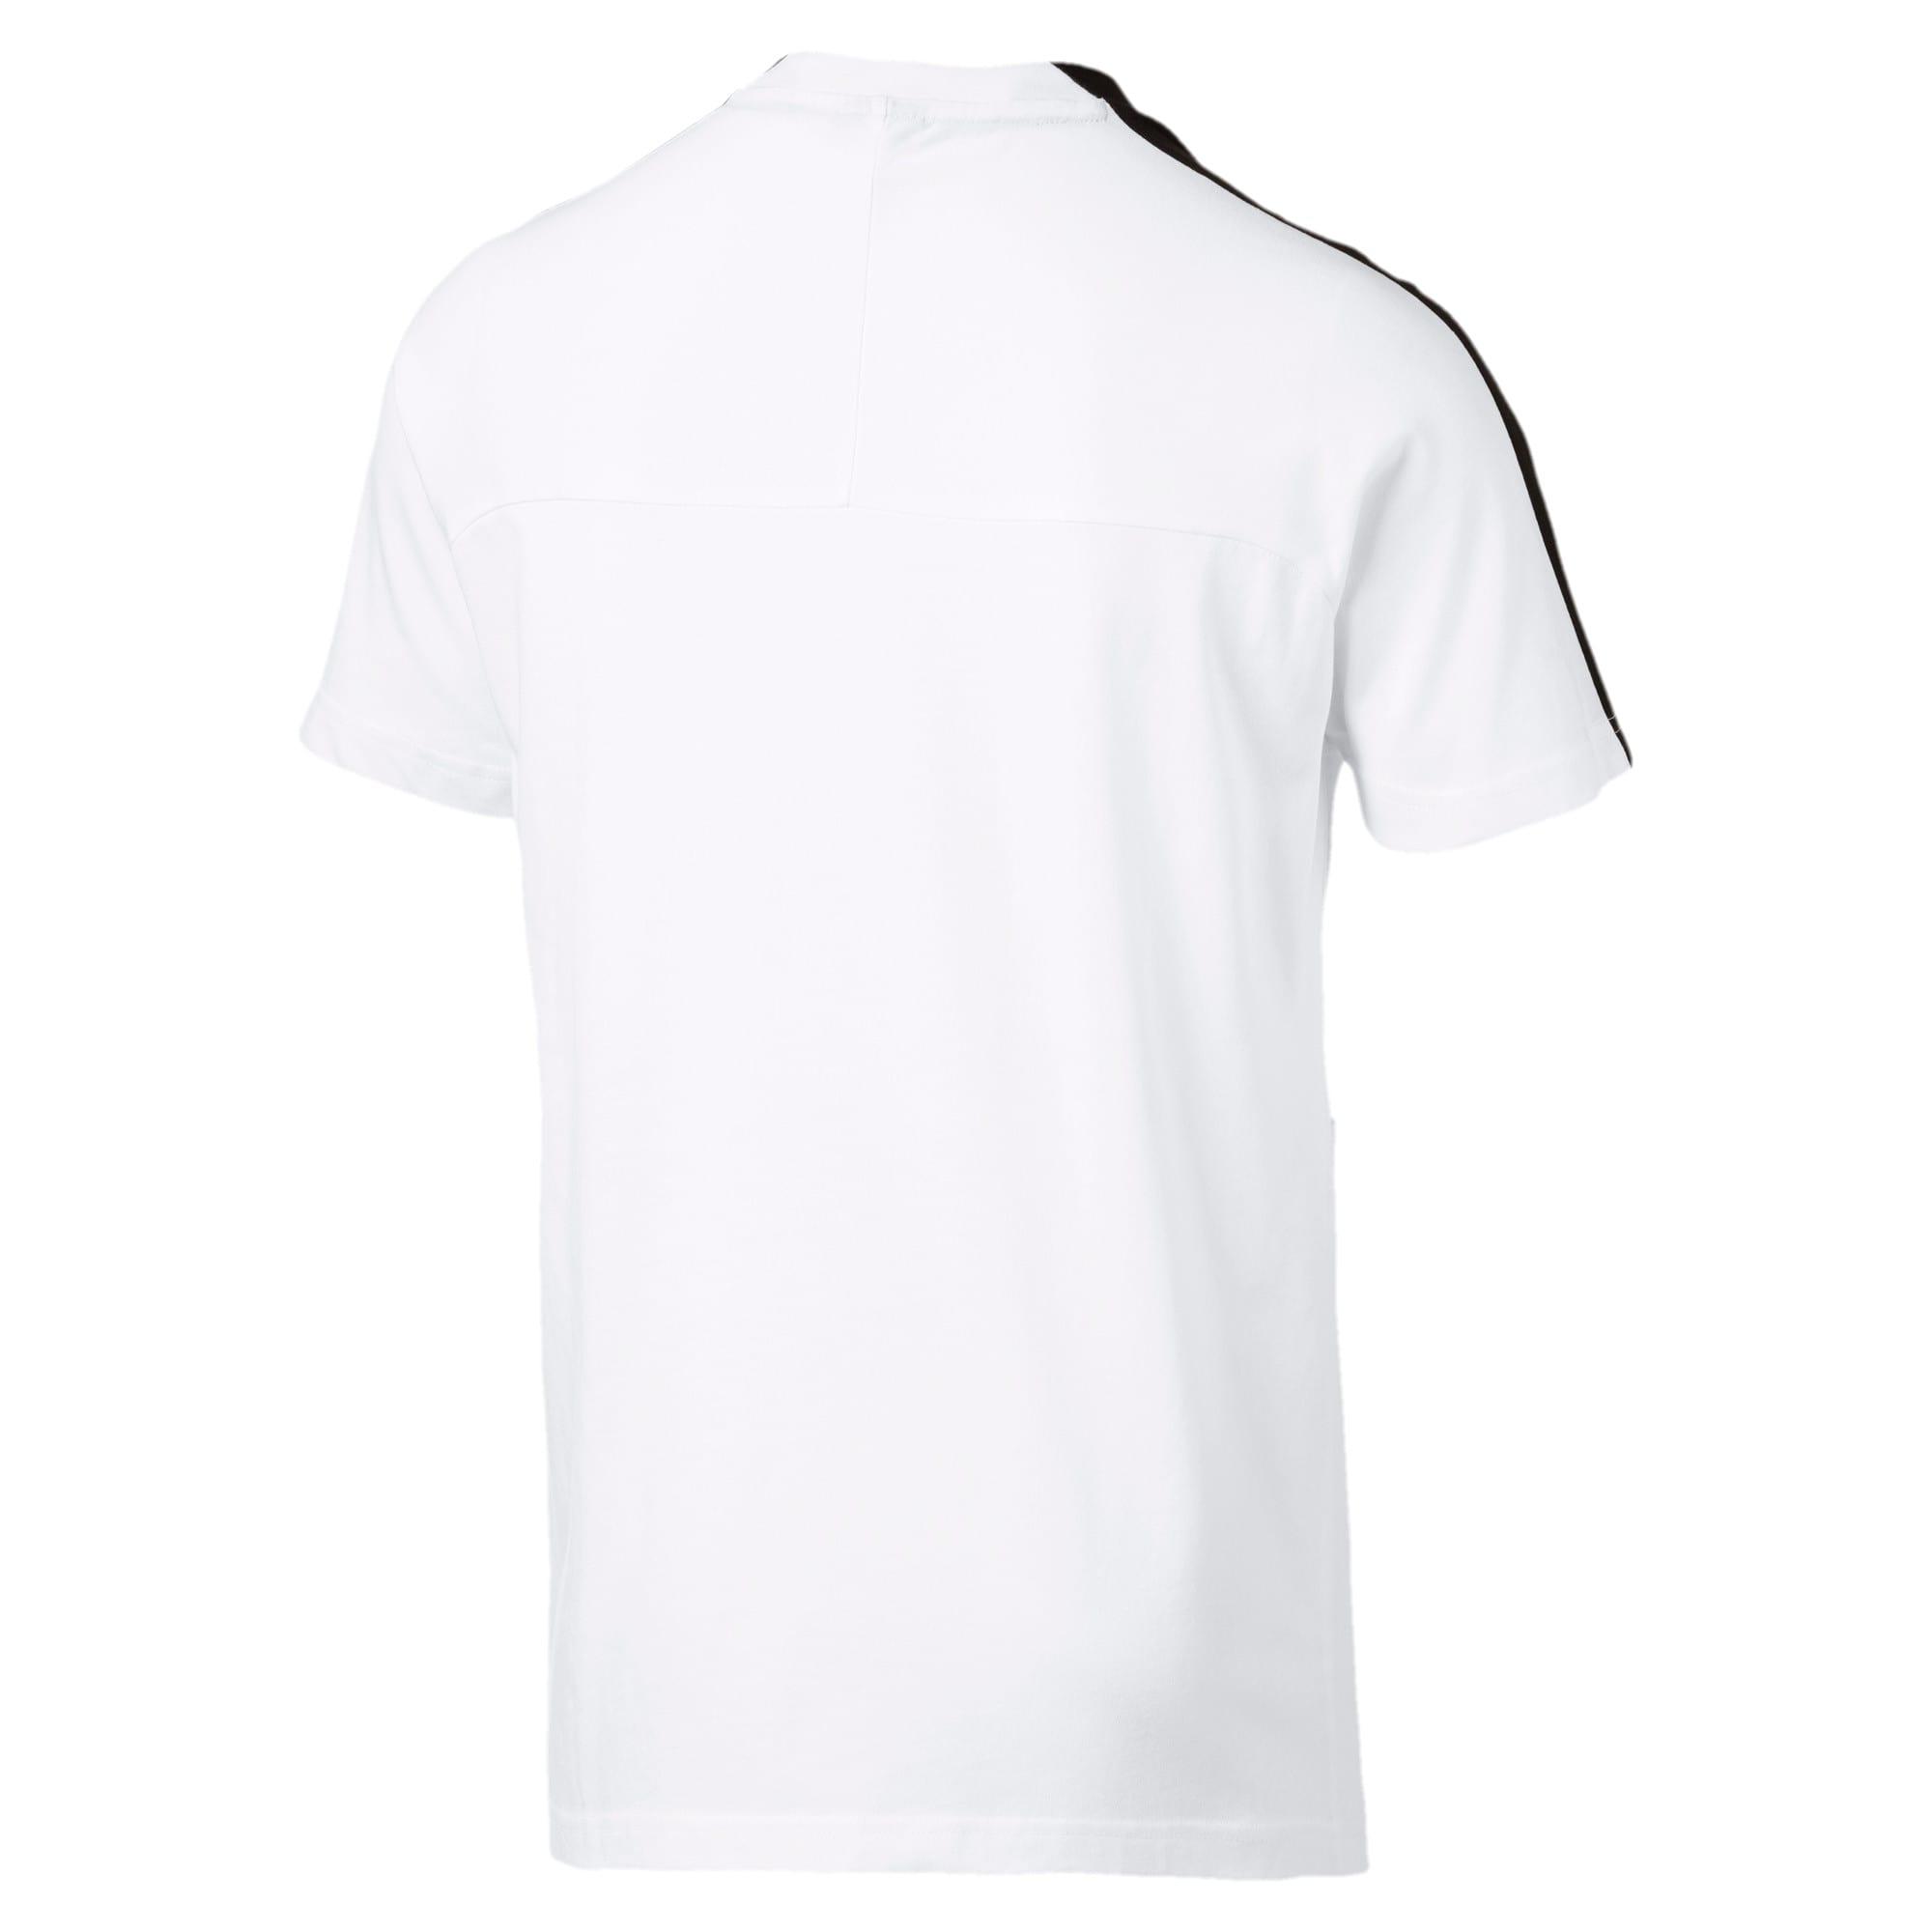 Thumbnail 2 of フェラーリ T7 Tシャツ, Puma White, medium-JPN